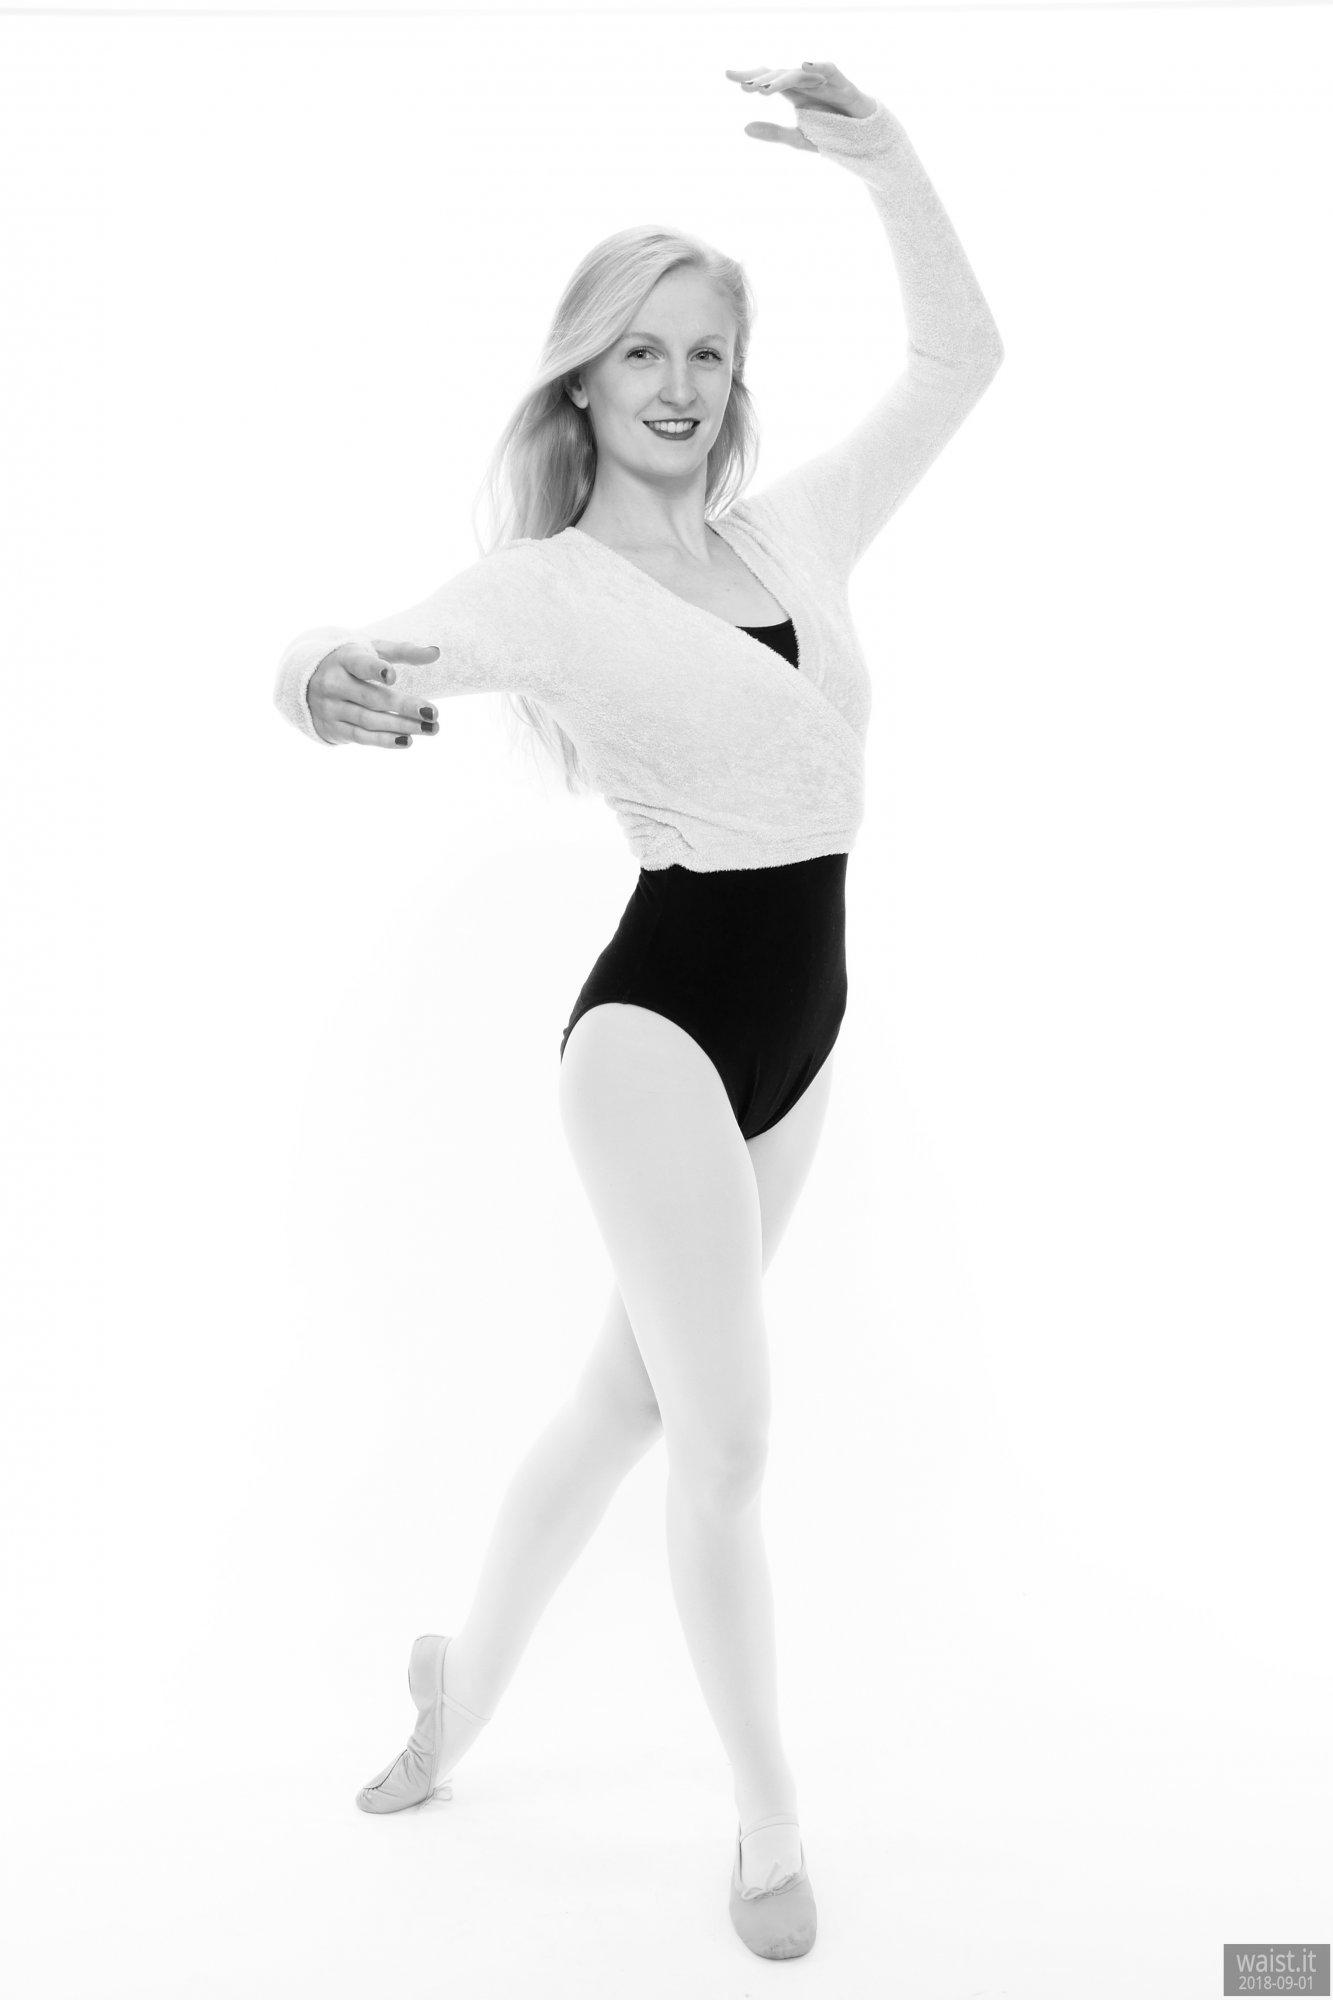 2018-09-01 Christina Elsom - in her own black leotard and pink dance top and ballet pumps